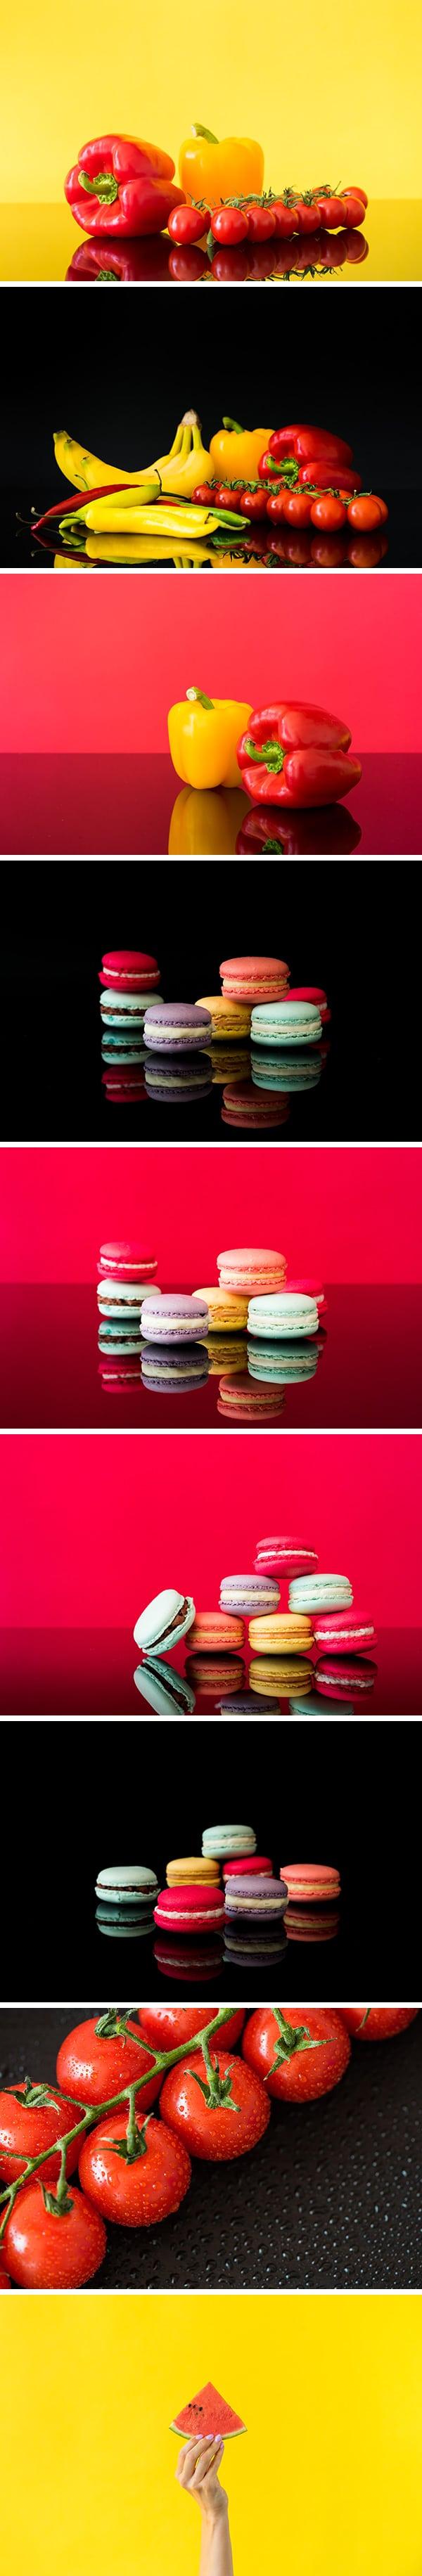 Food Studio Shots